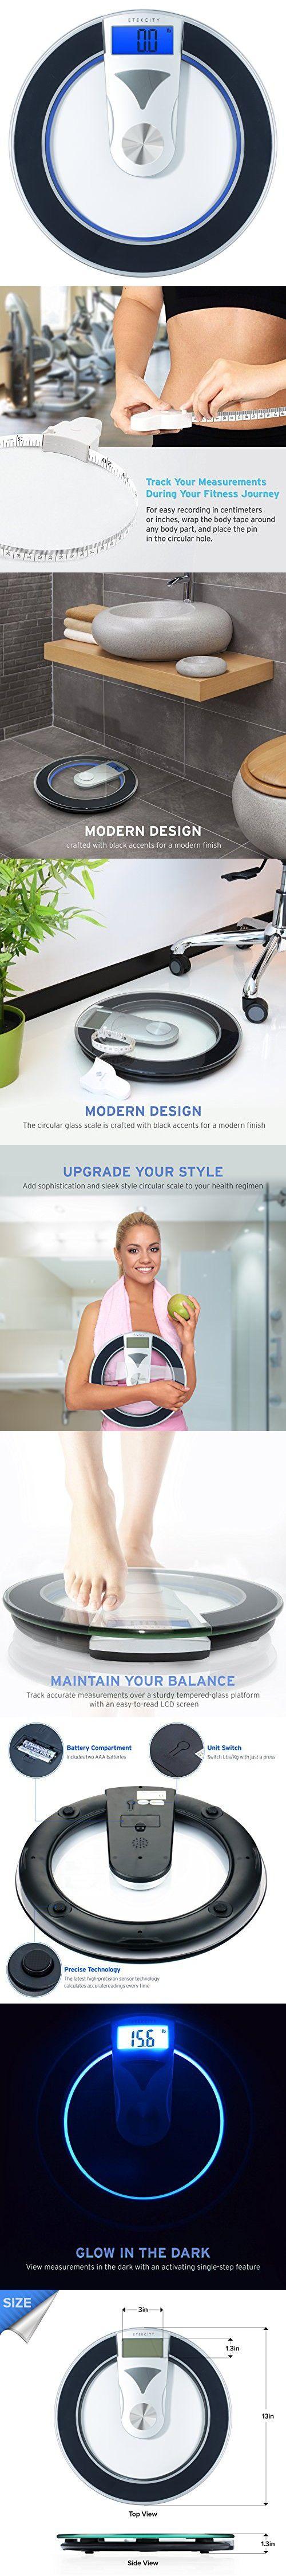 Website Picture Gallery Etekcity Digital Body Weight Bathroom Scale Modern Design Pounds Black